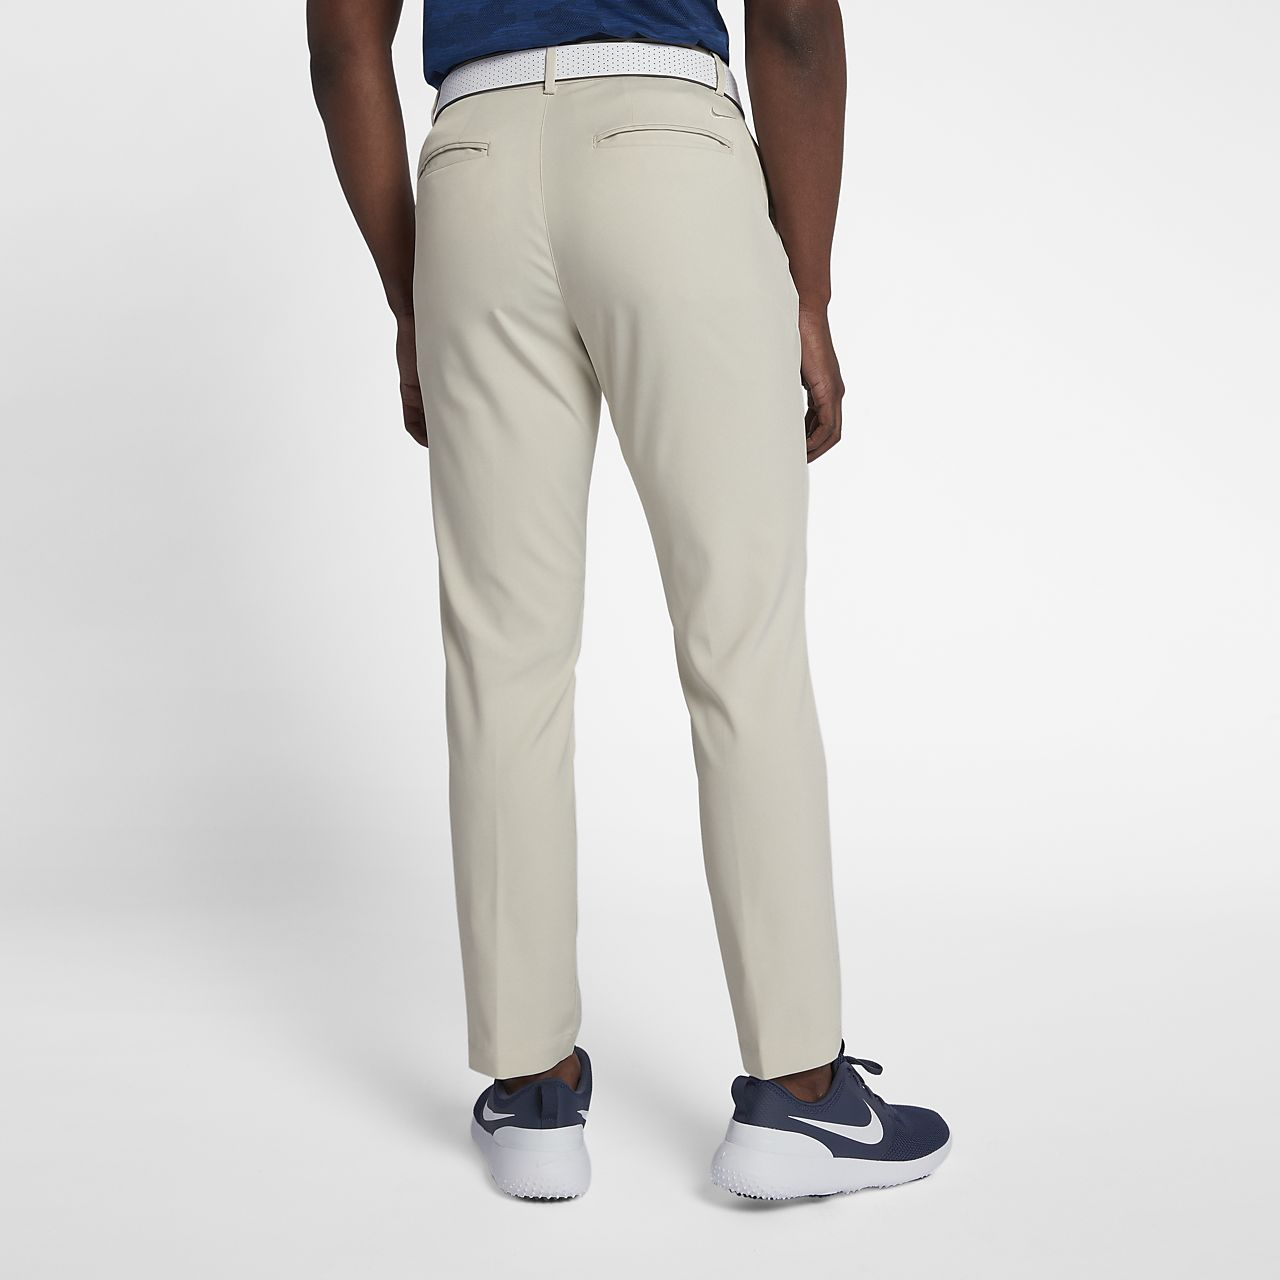 95359708cf7e Nike Flex Men s Golf Trousers. Nike.com SA